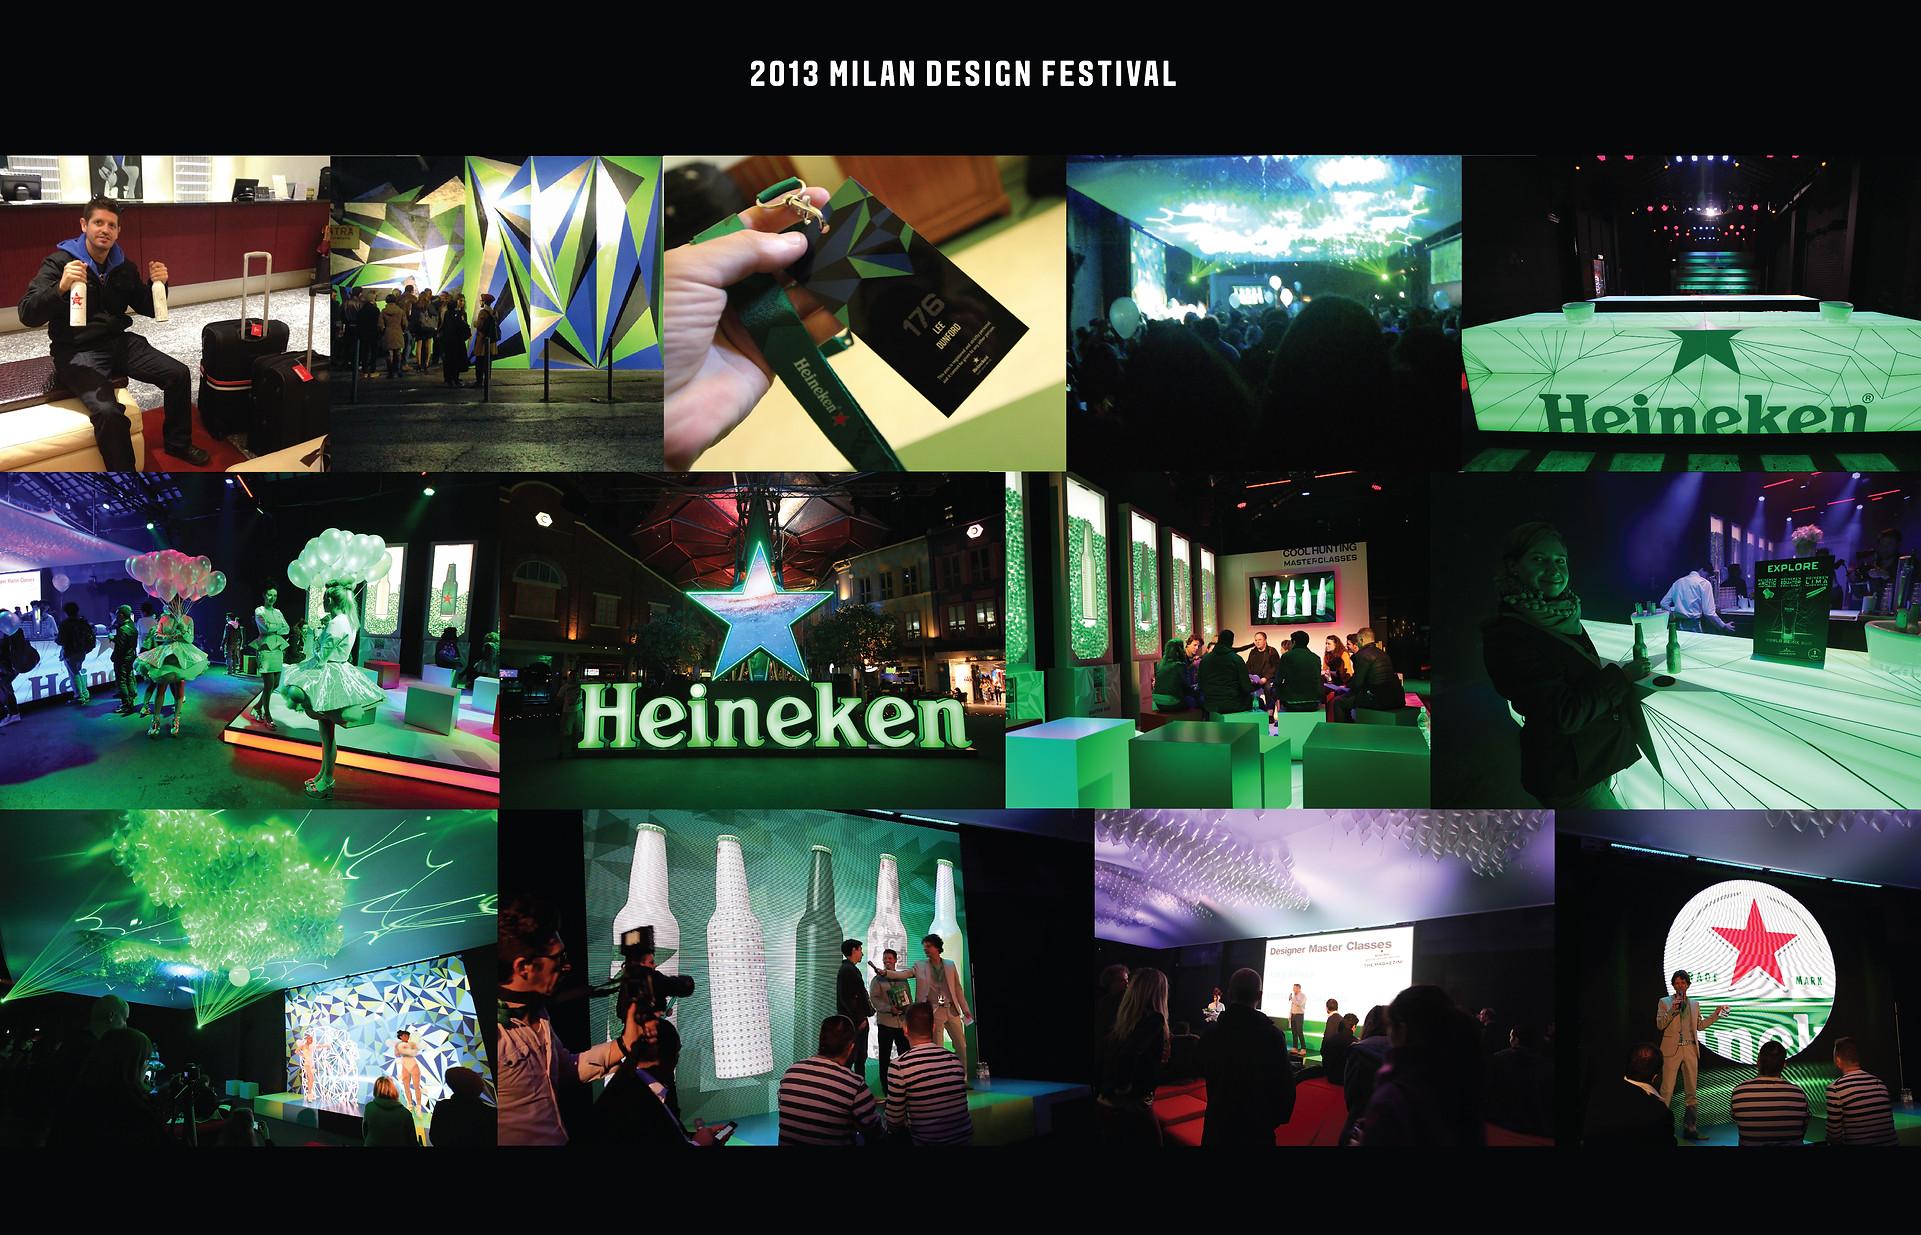 HEINEKEN_FUTURE-06.jpg